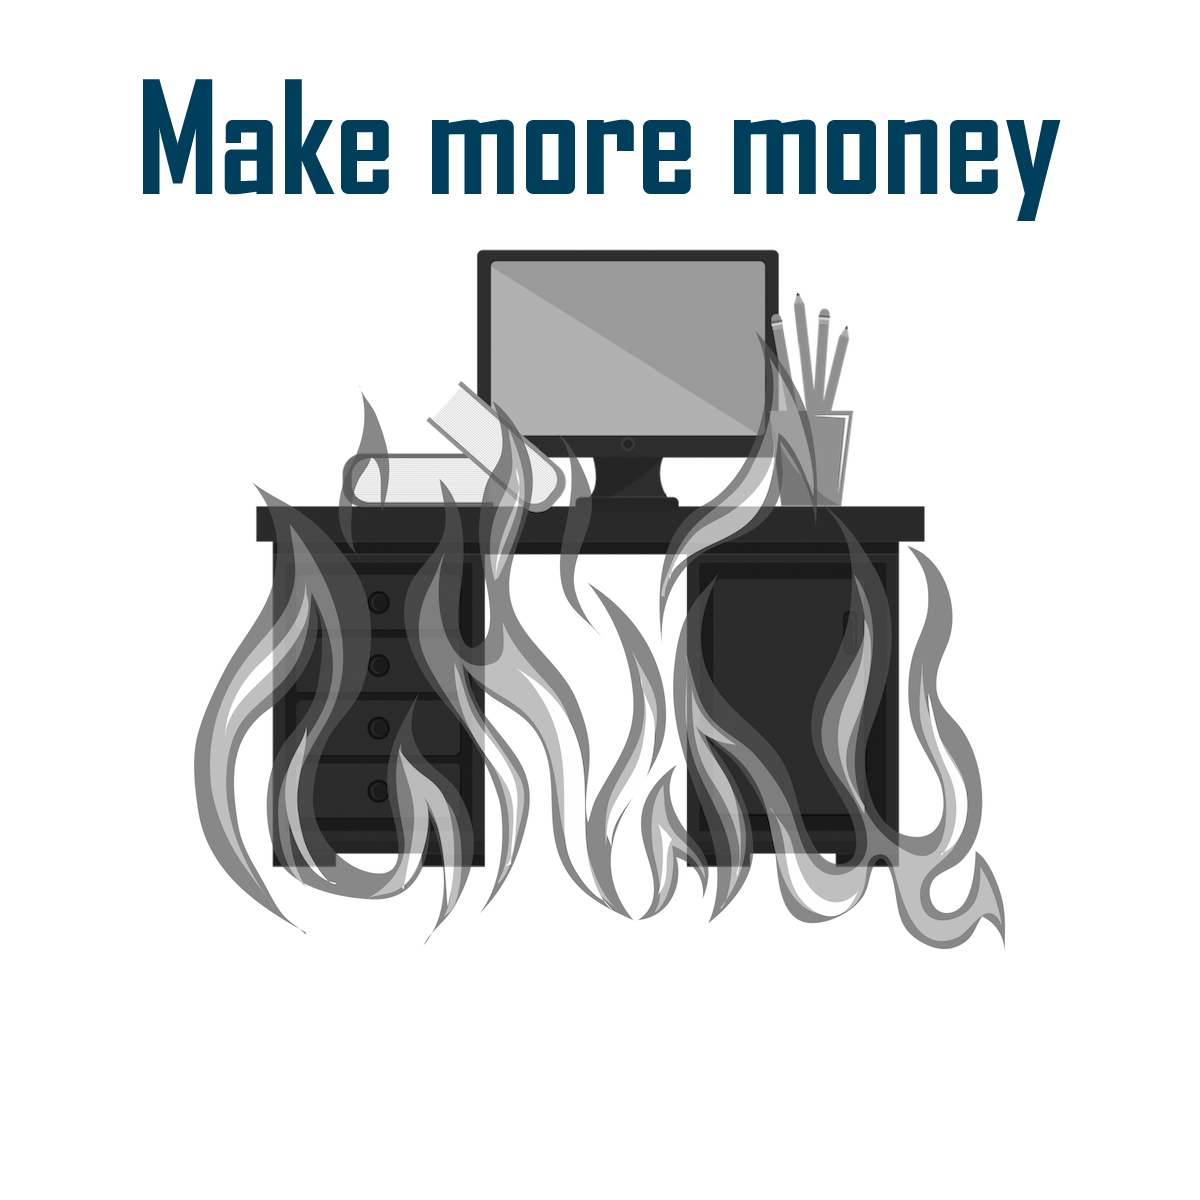 Practice Management | Make More Money